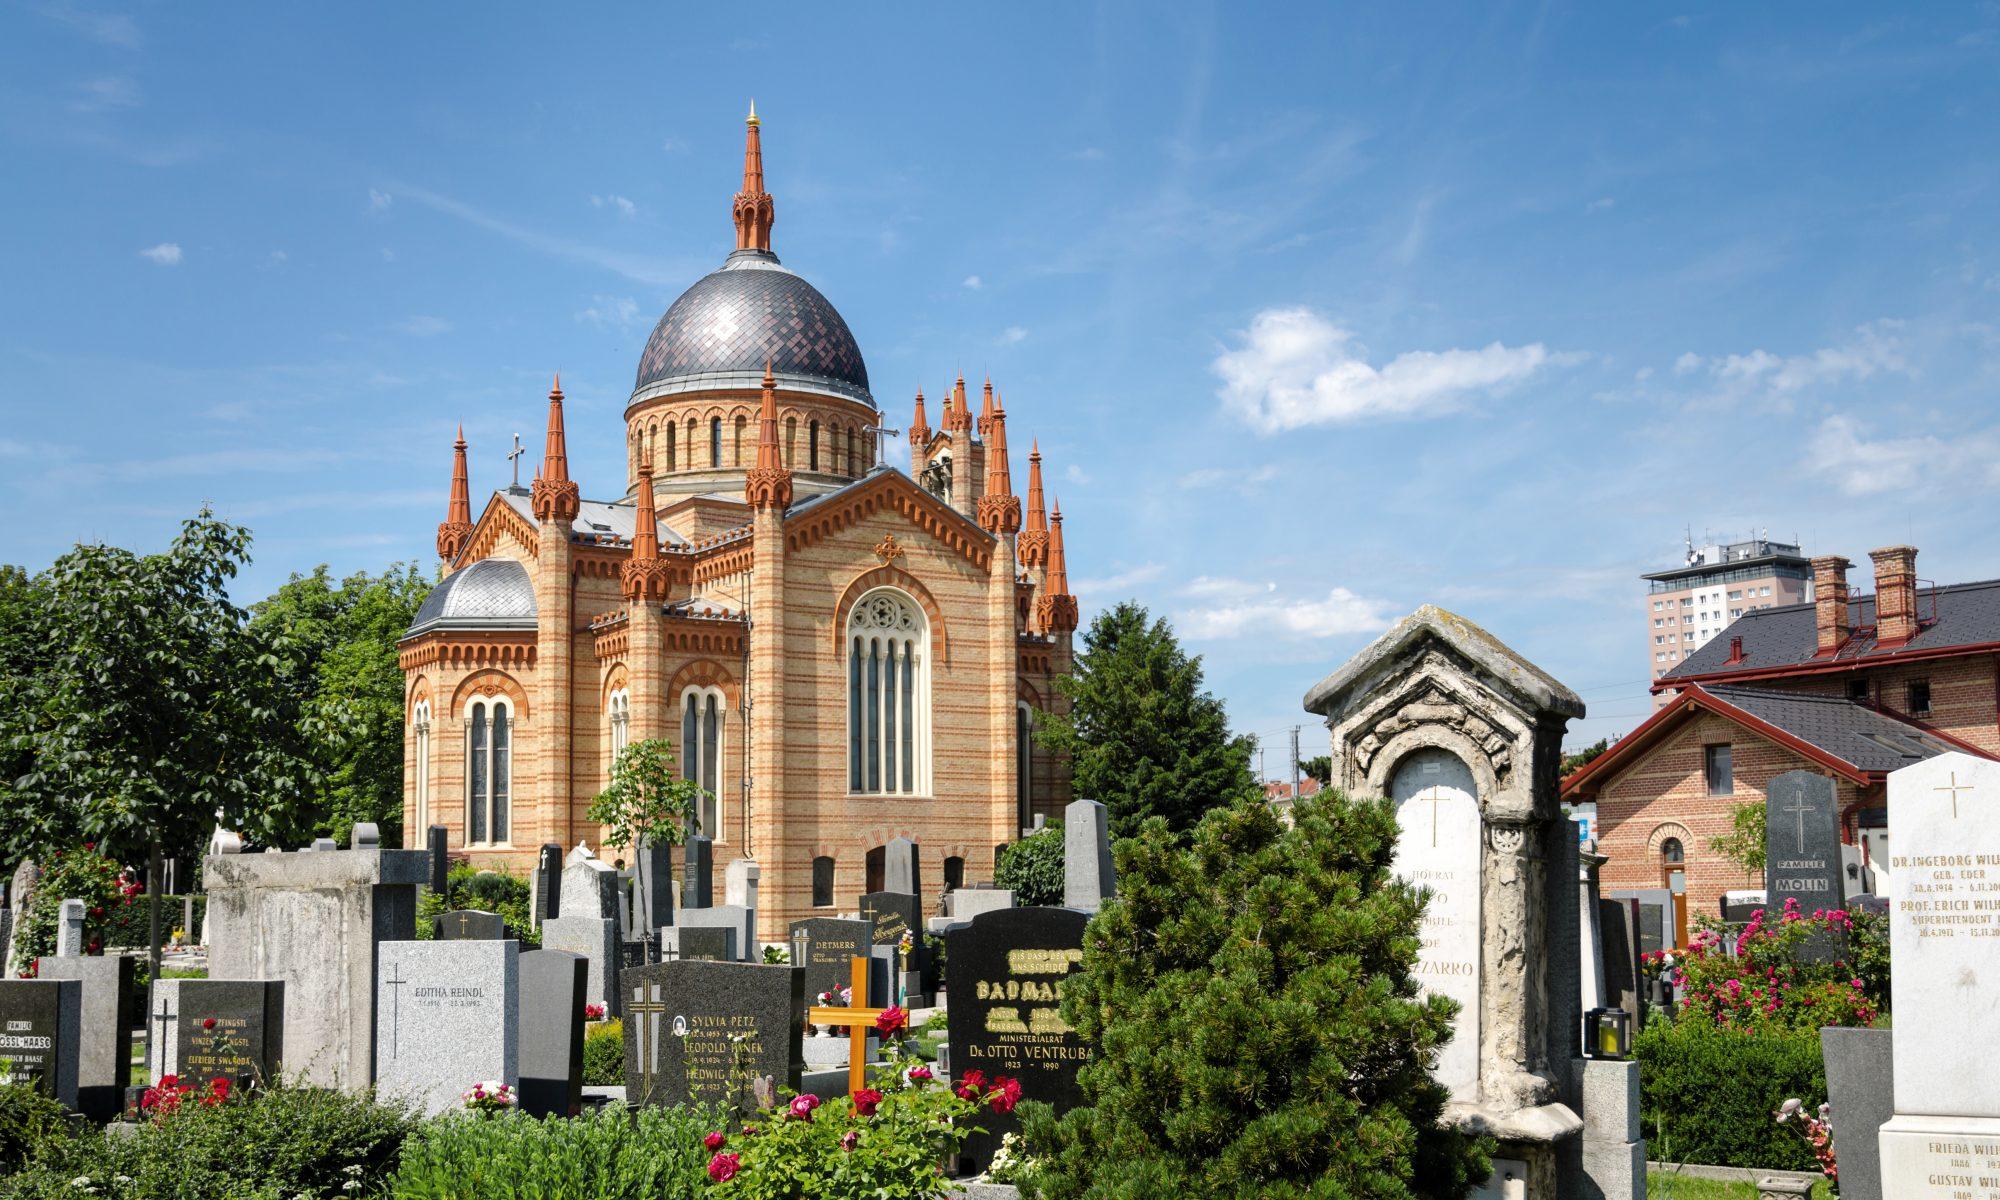 Evangelischer Friedhof Matzleinsdorf